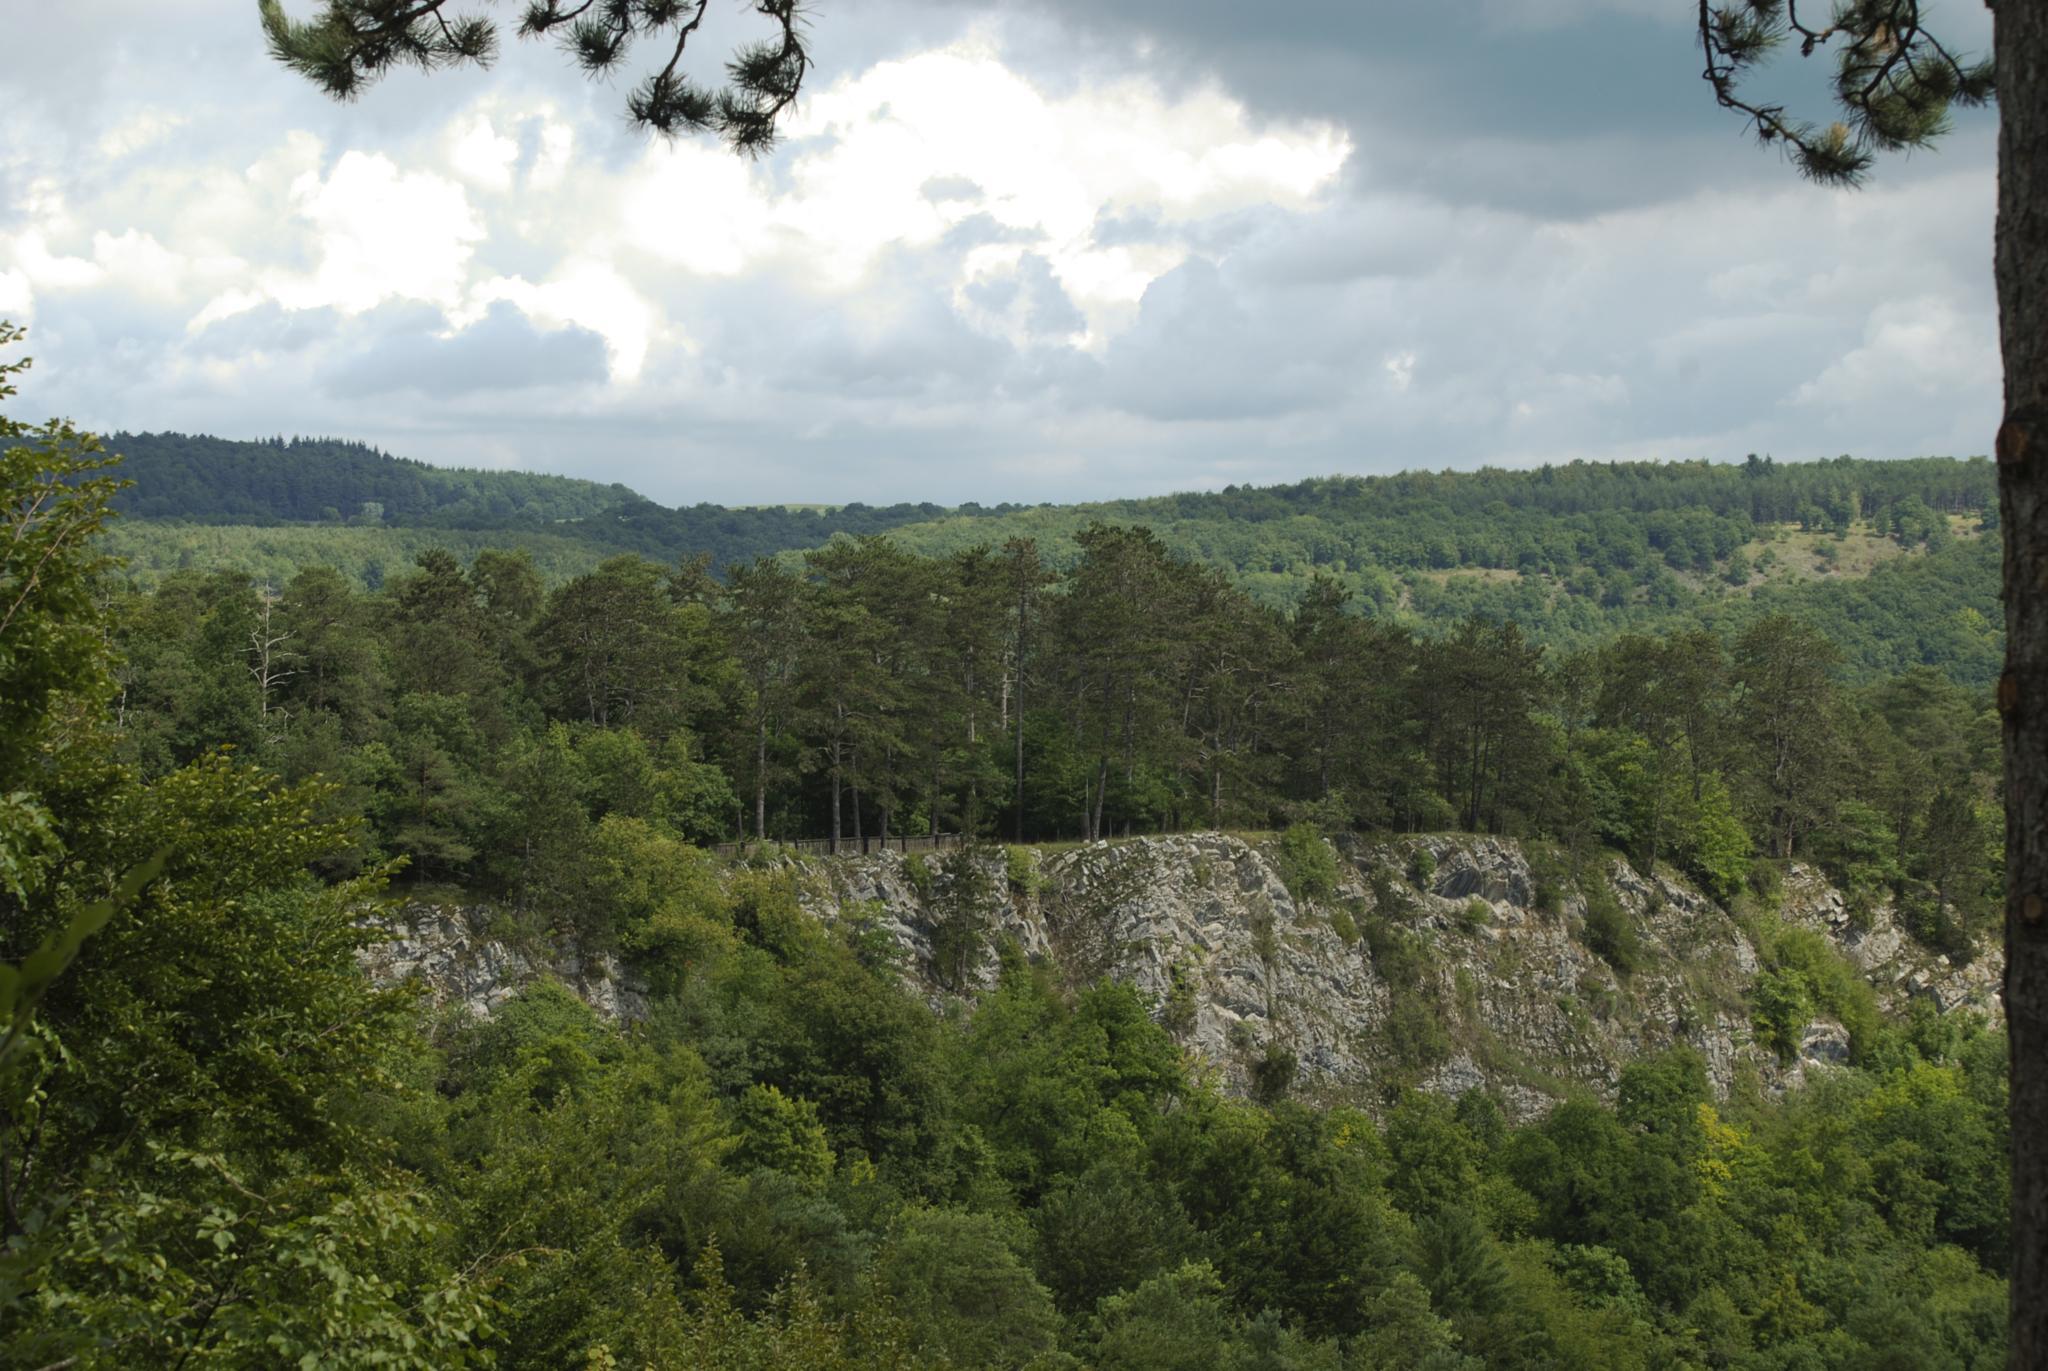 Mountain view by raimonddehoogt